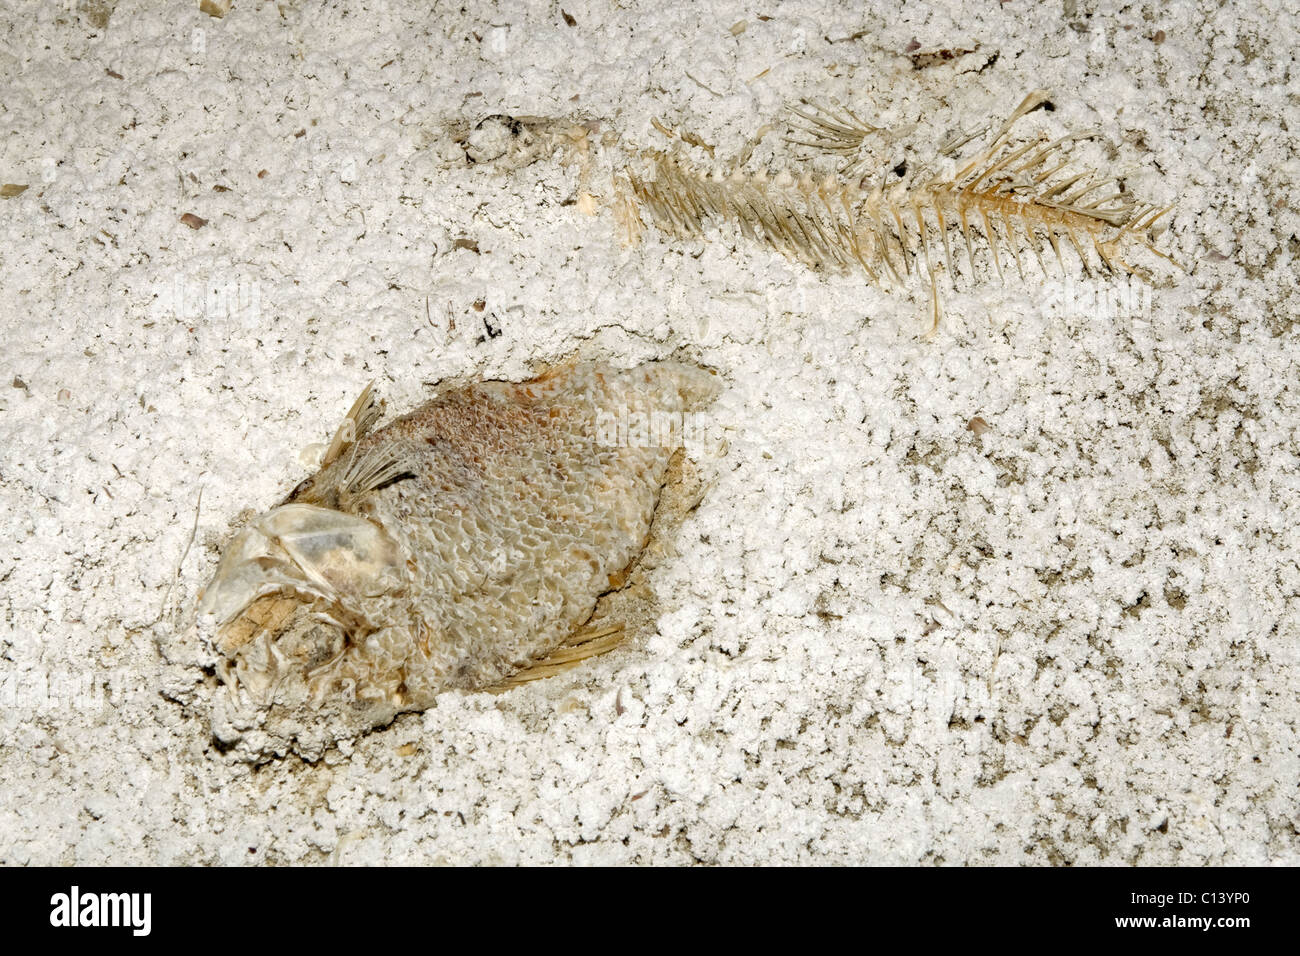 Fish skeletons in the sediment of the Salton Sea, California. - Stock Image